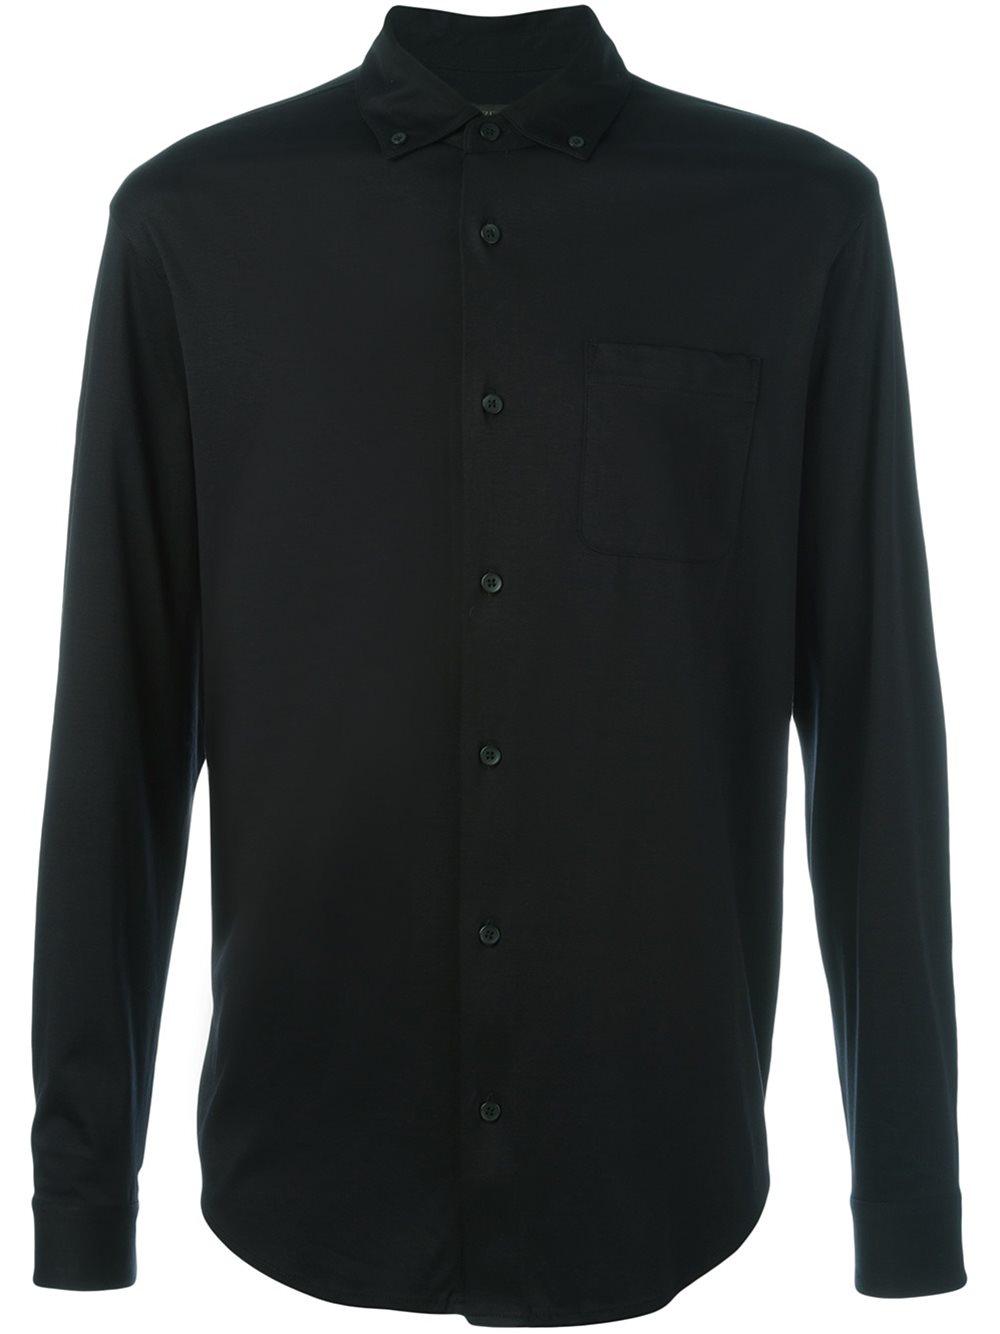 Ermenegildo zegna long sleeve polo shirt in black for men for Zegna polo shirts sale